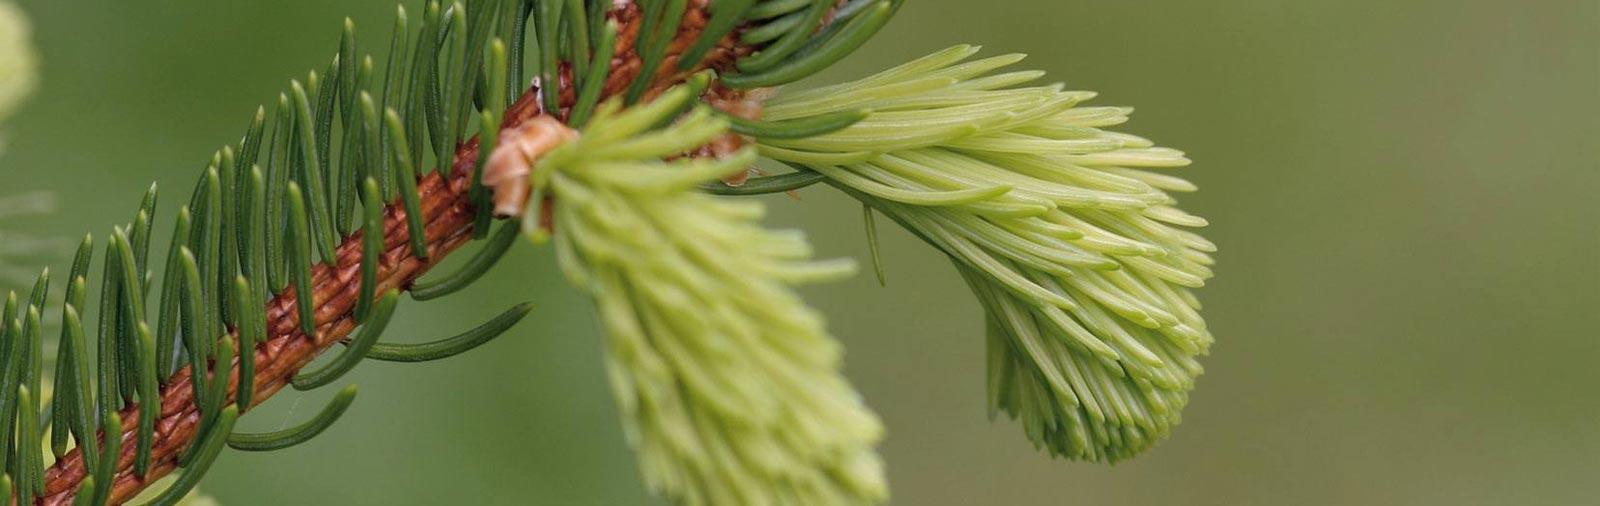 Fijnspar - Picea abies L.